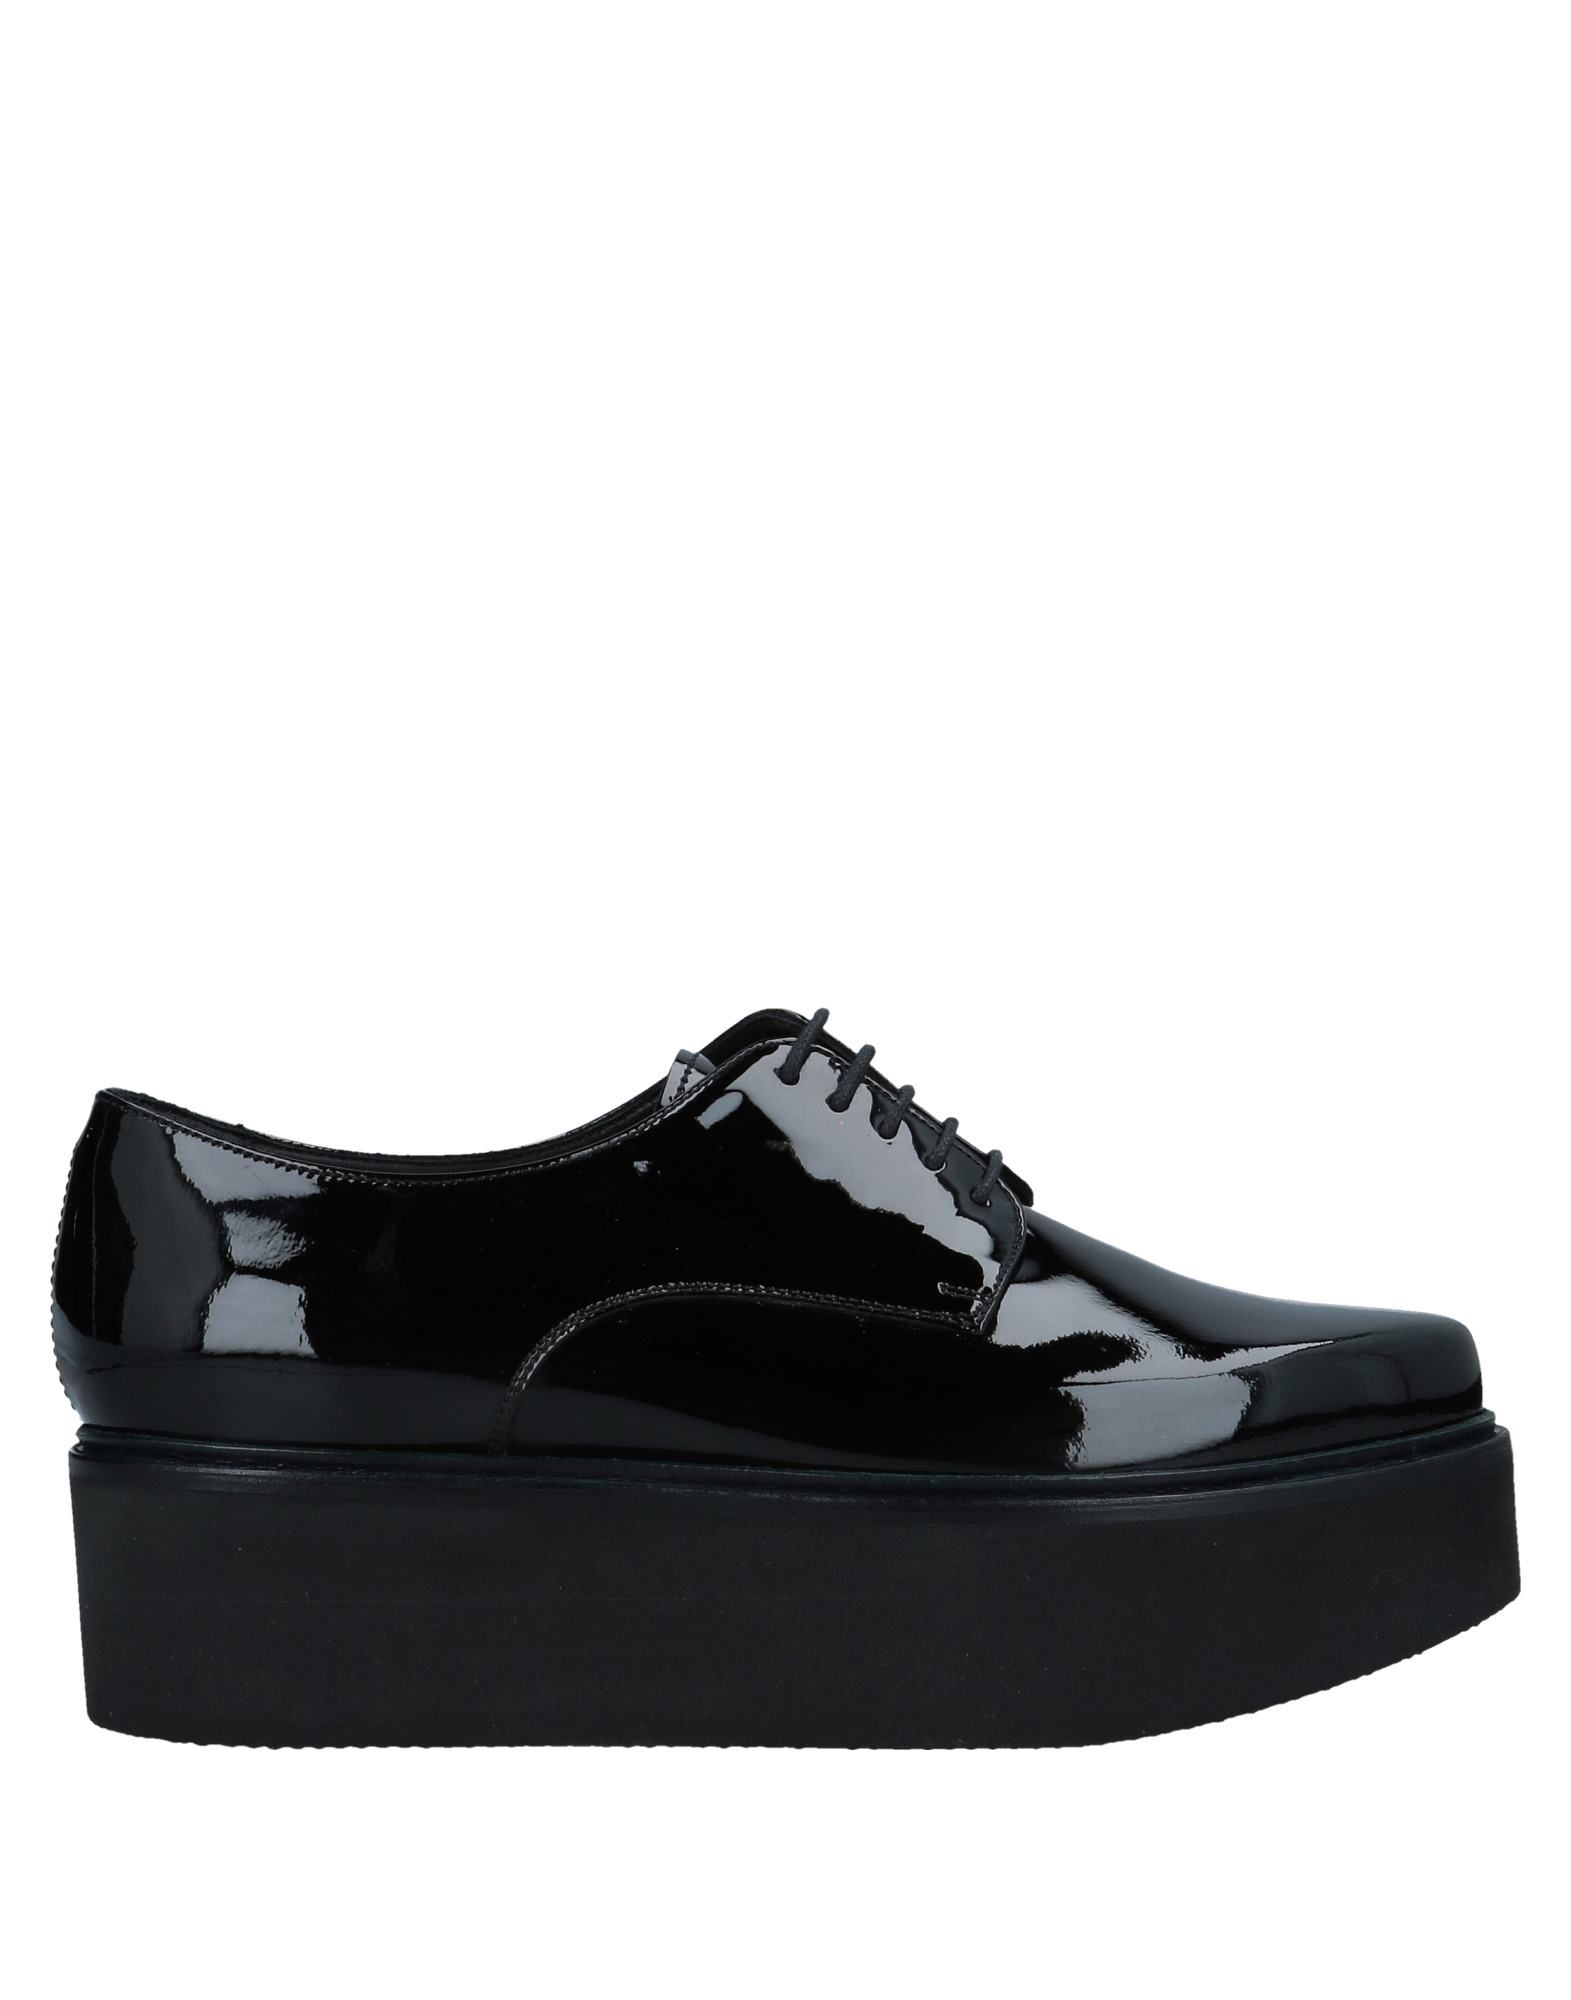 Fratelli Rossetti Schnürschuhe Damen  11548507LMGut aussehende strapazierfähige Schuhe